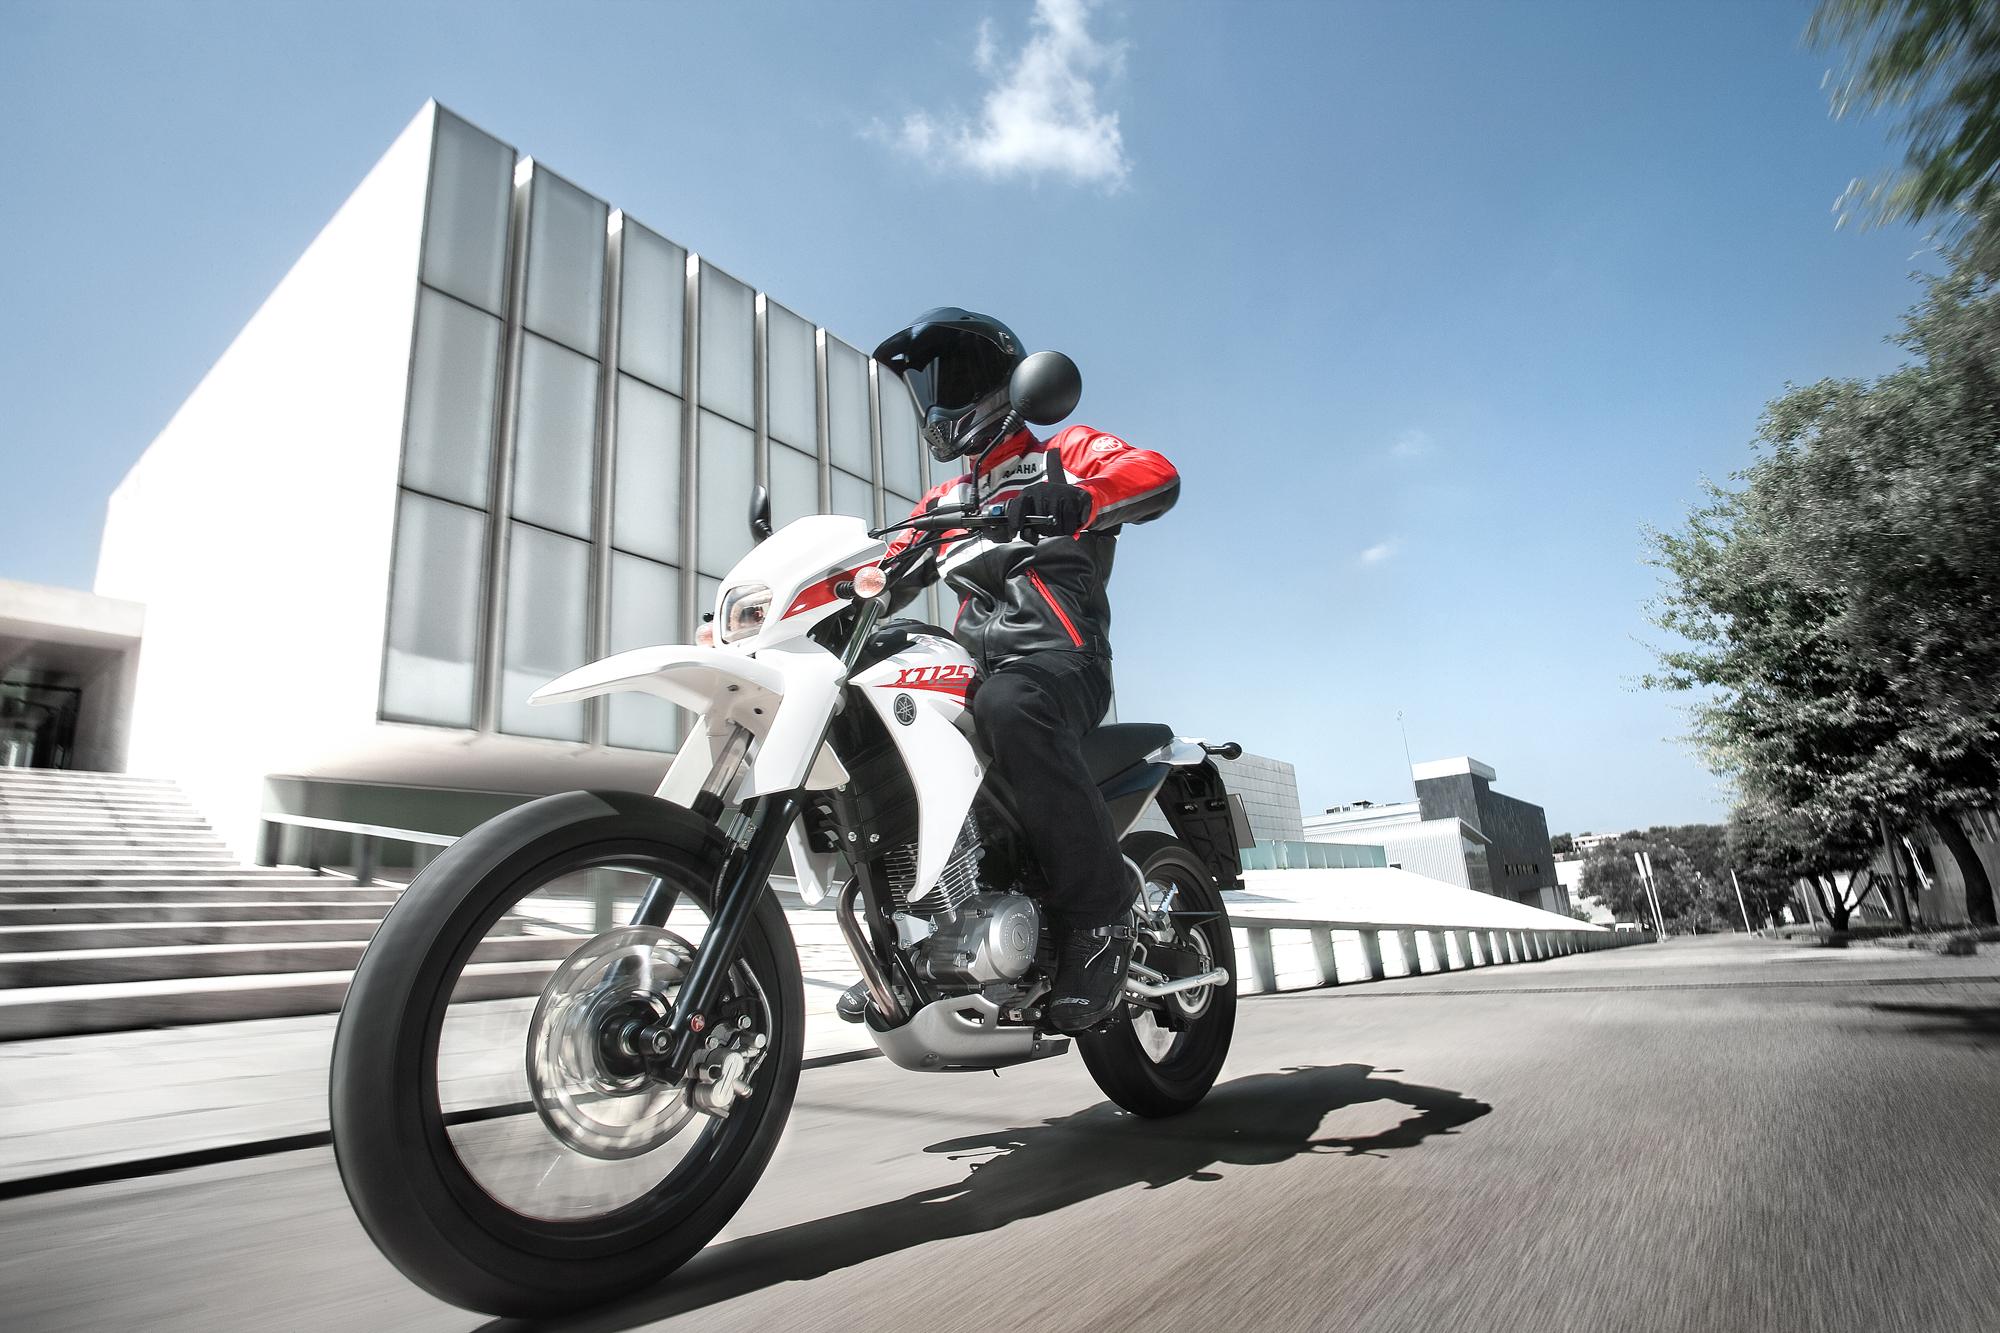 Yamaha WR125X/R 2013 - Modellnews